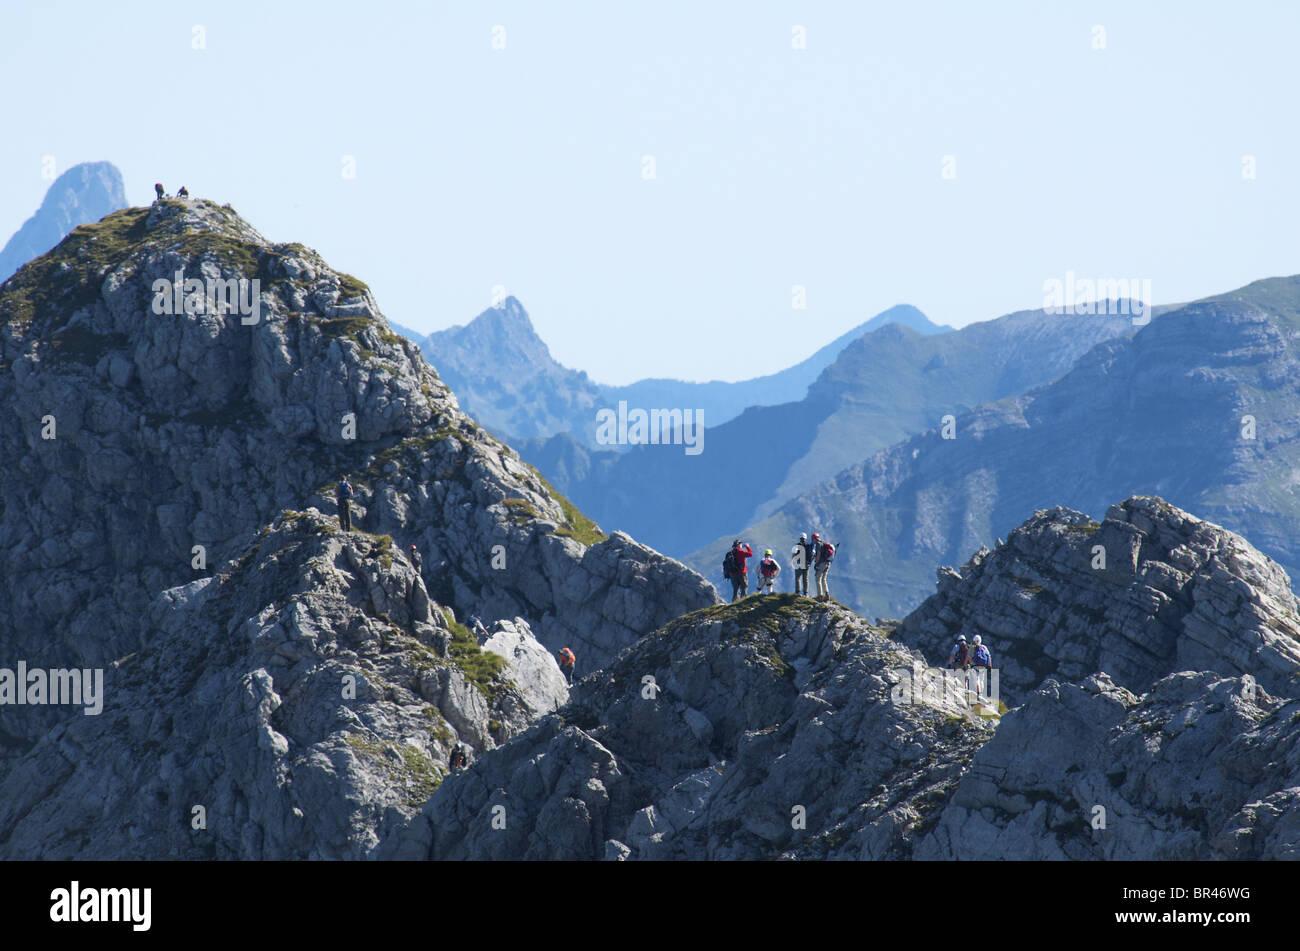 Klettersteig Bavaria : Hindelanger klettersteig nebelhorn allgaeu alps bavaria